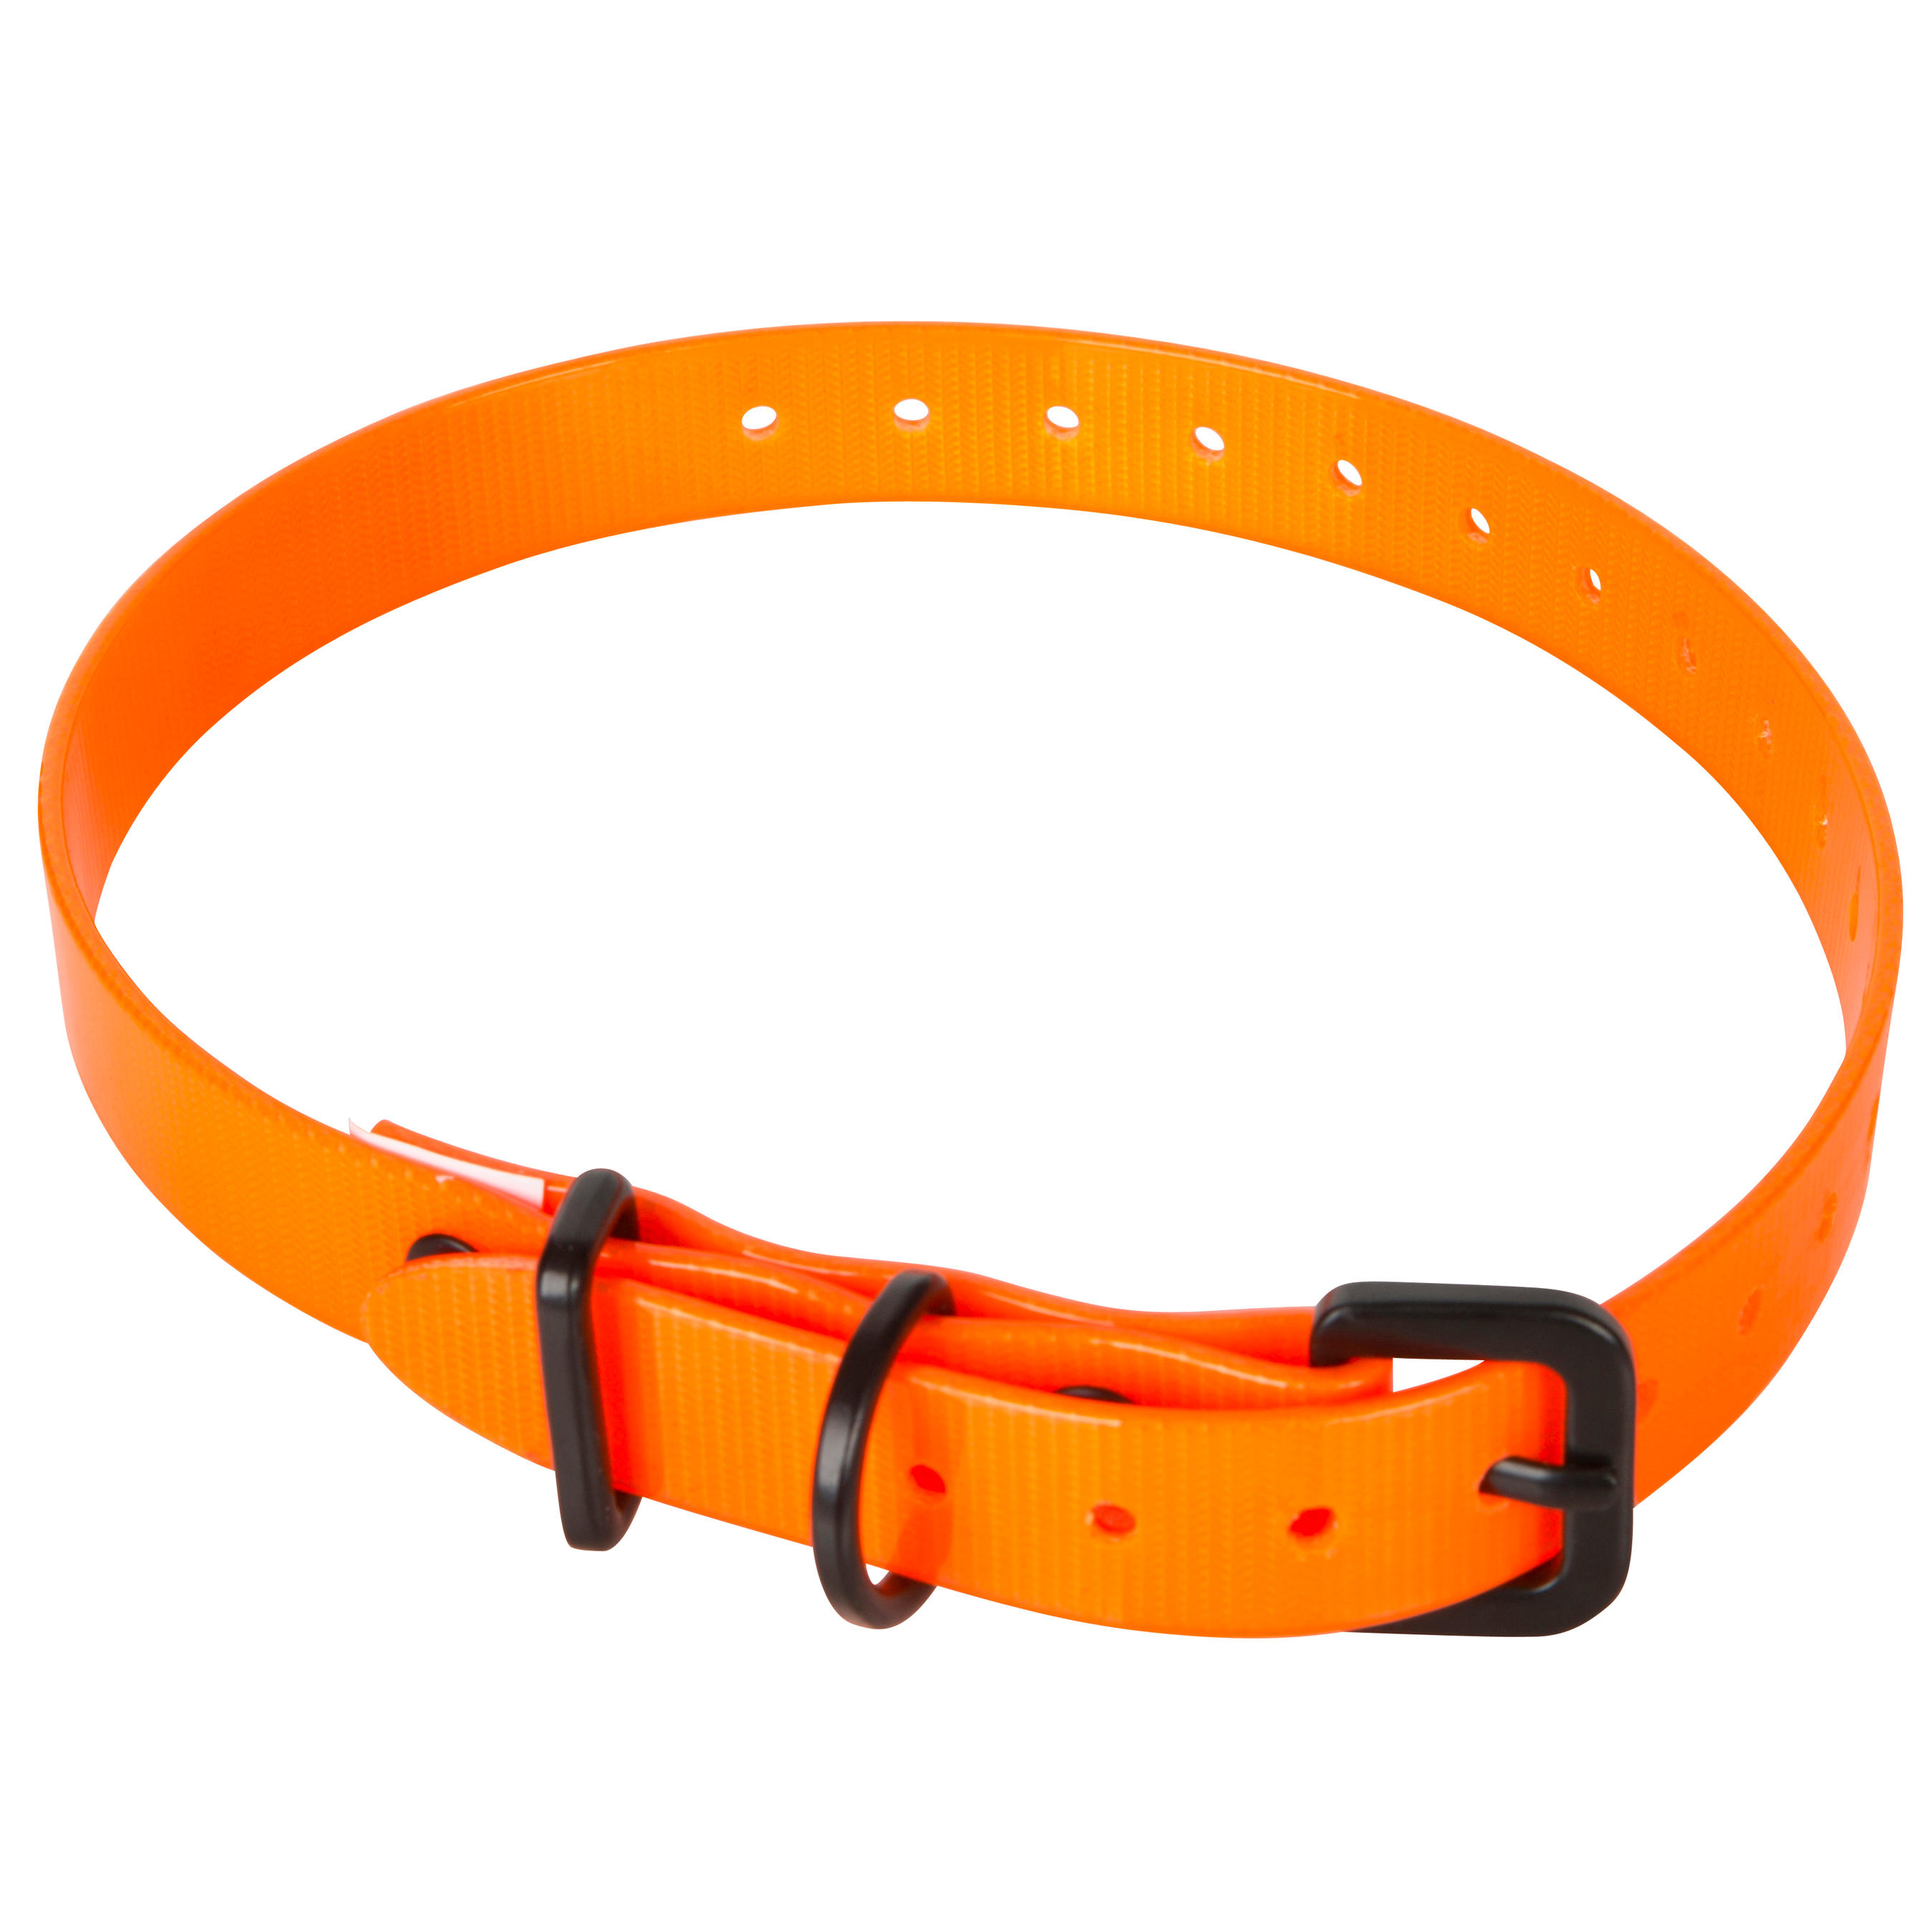 300 dog collar orange